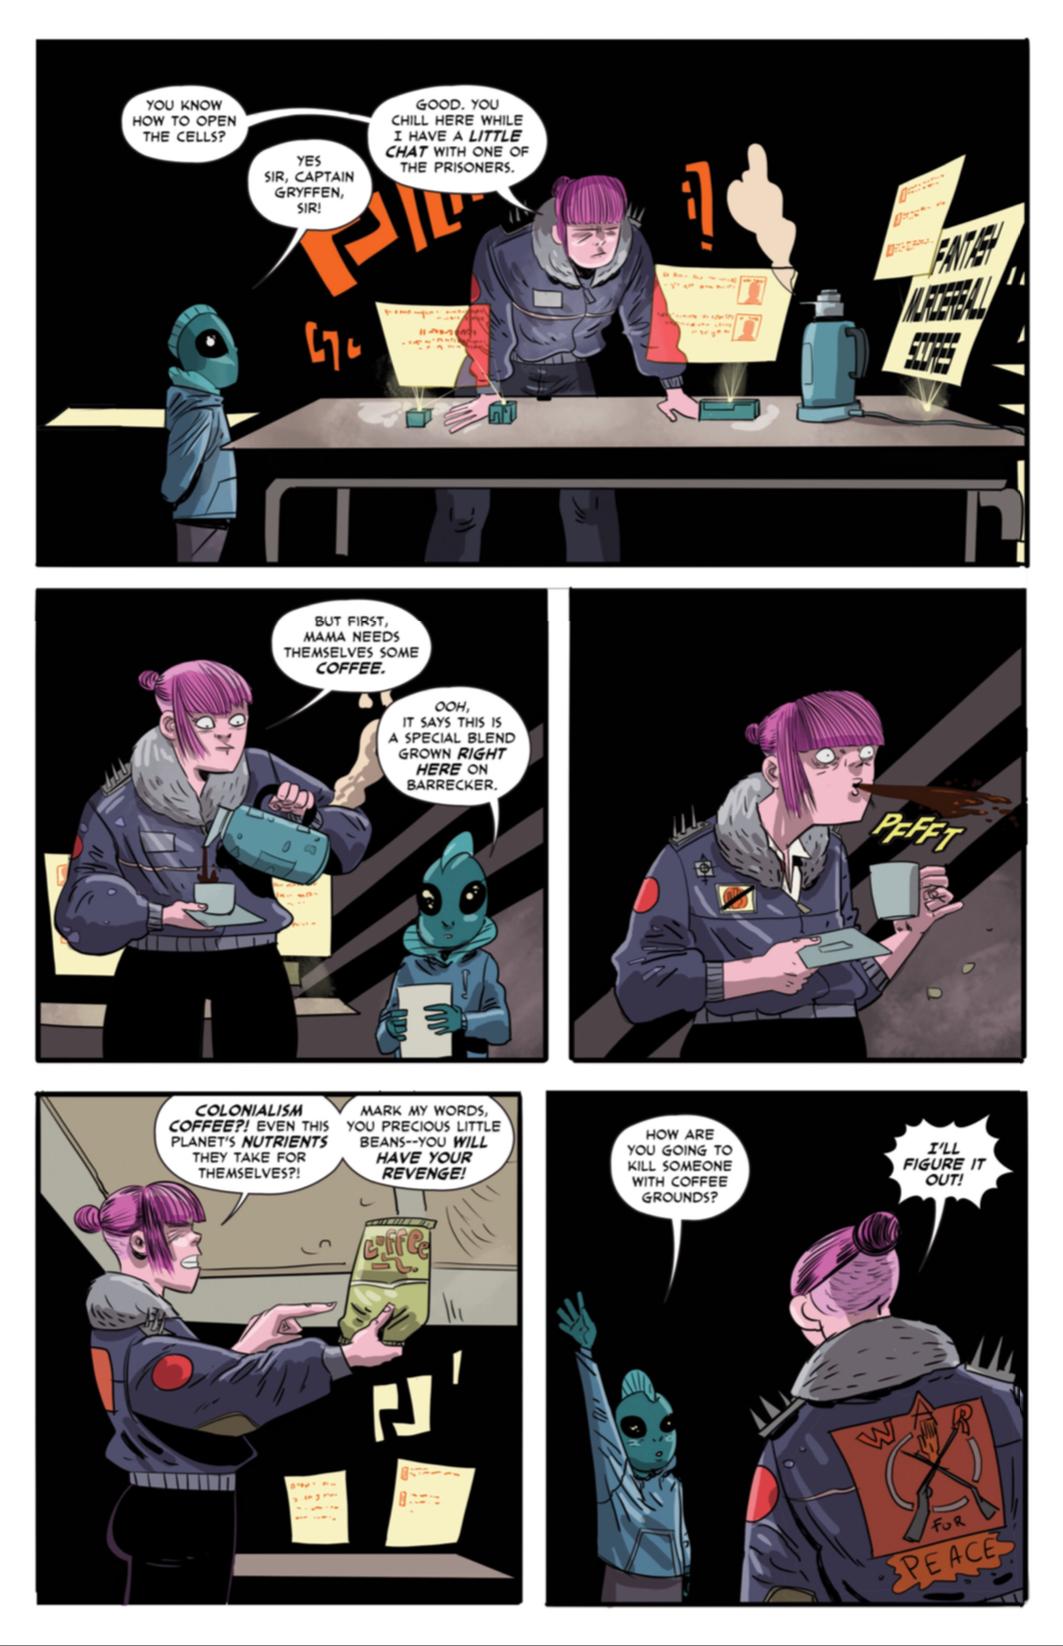 Gryffen: Galaxy's Most Wanted #8; page three: Gryffen gets a taste of colonialist coffee.